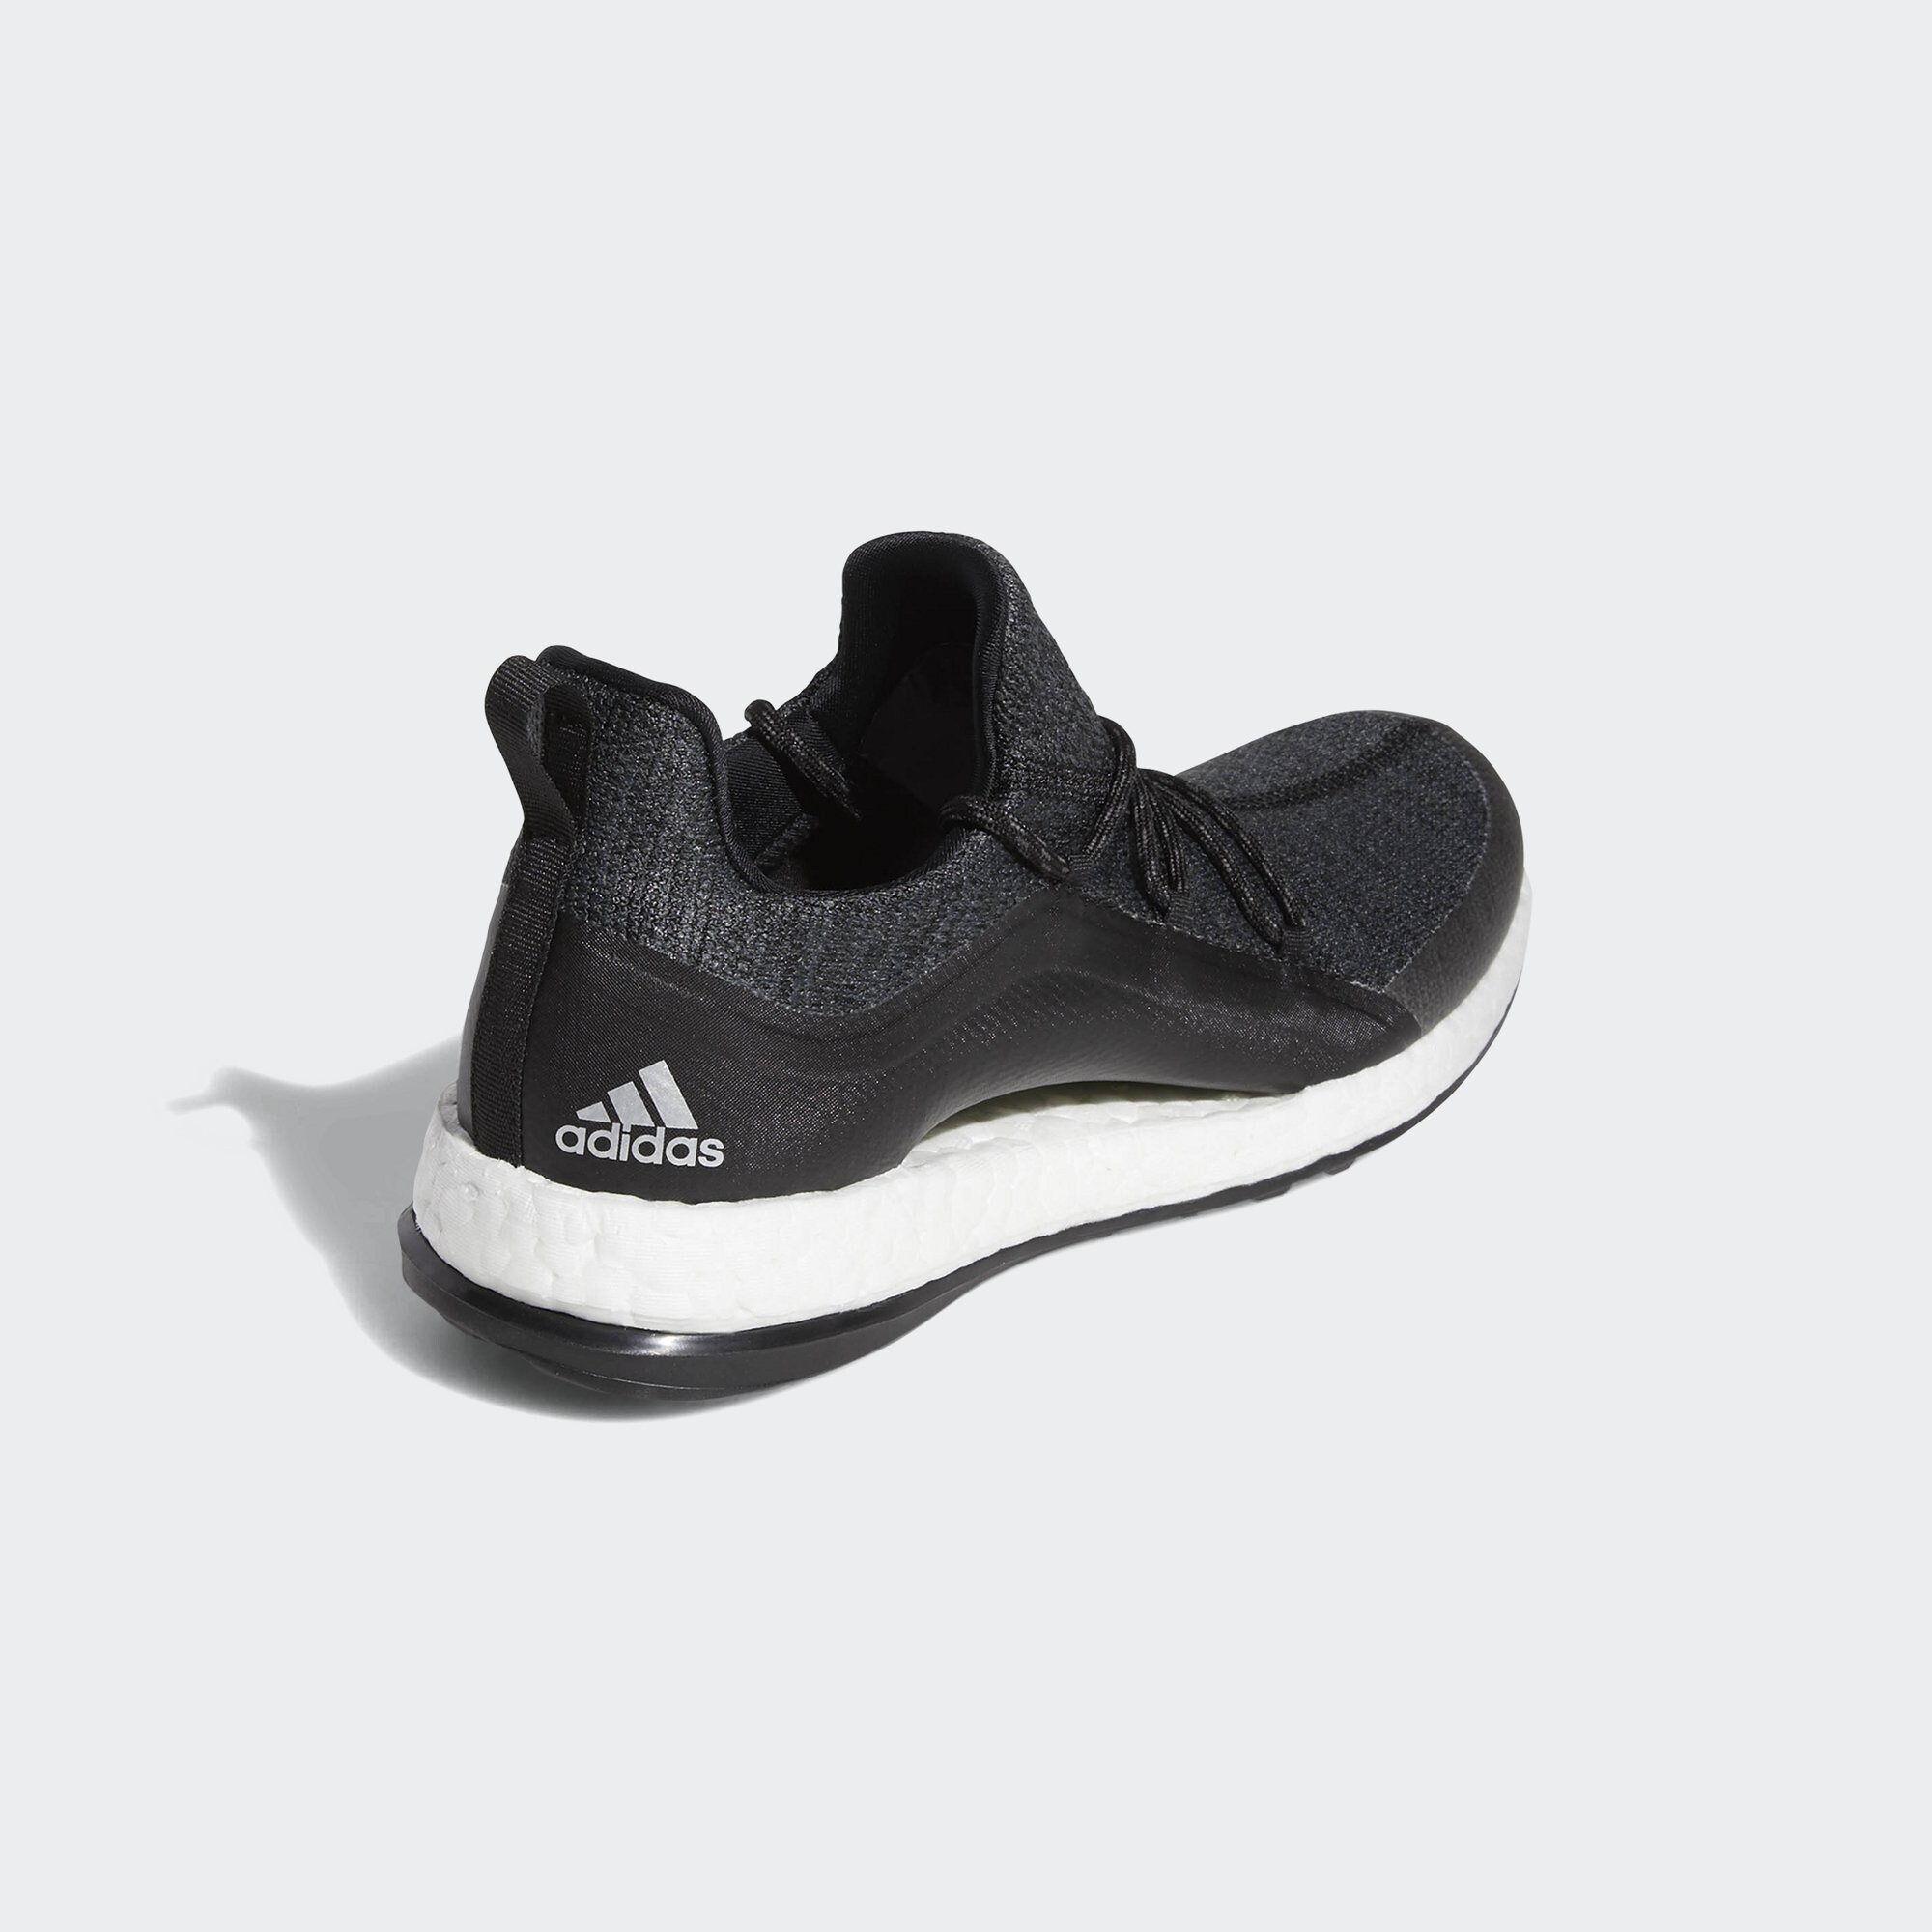 New Adidas Women's Pureboost XG 2 Black/Grey/Silver Met. Golf Shoes BD7195